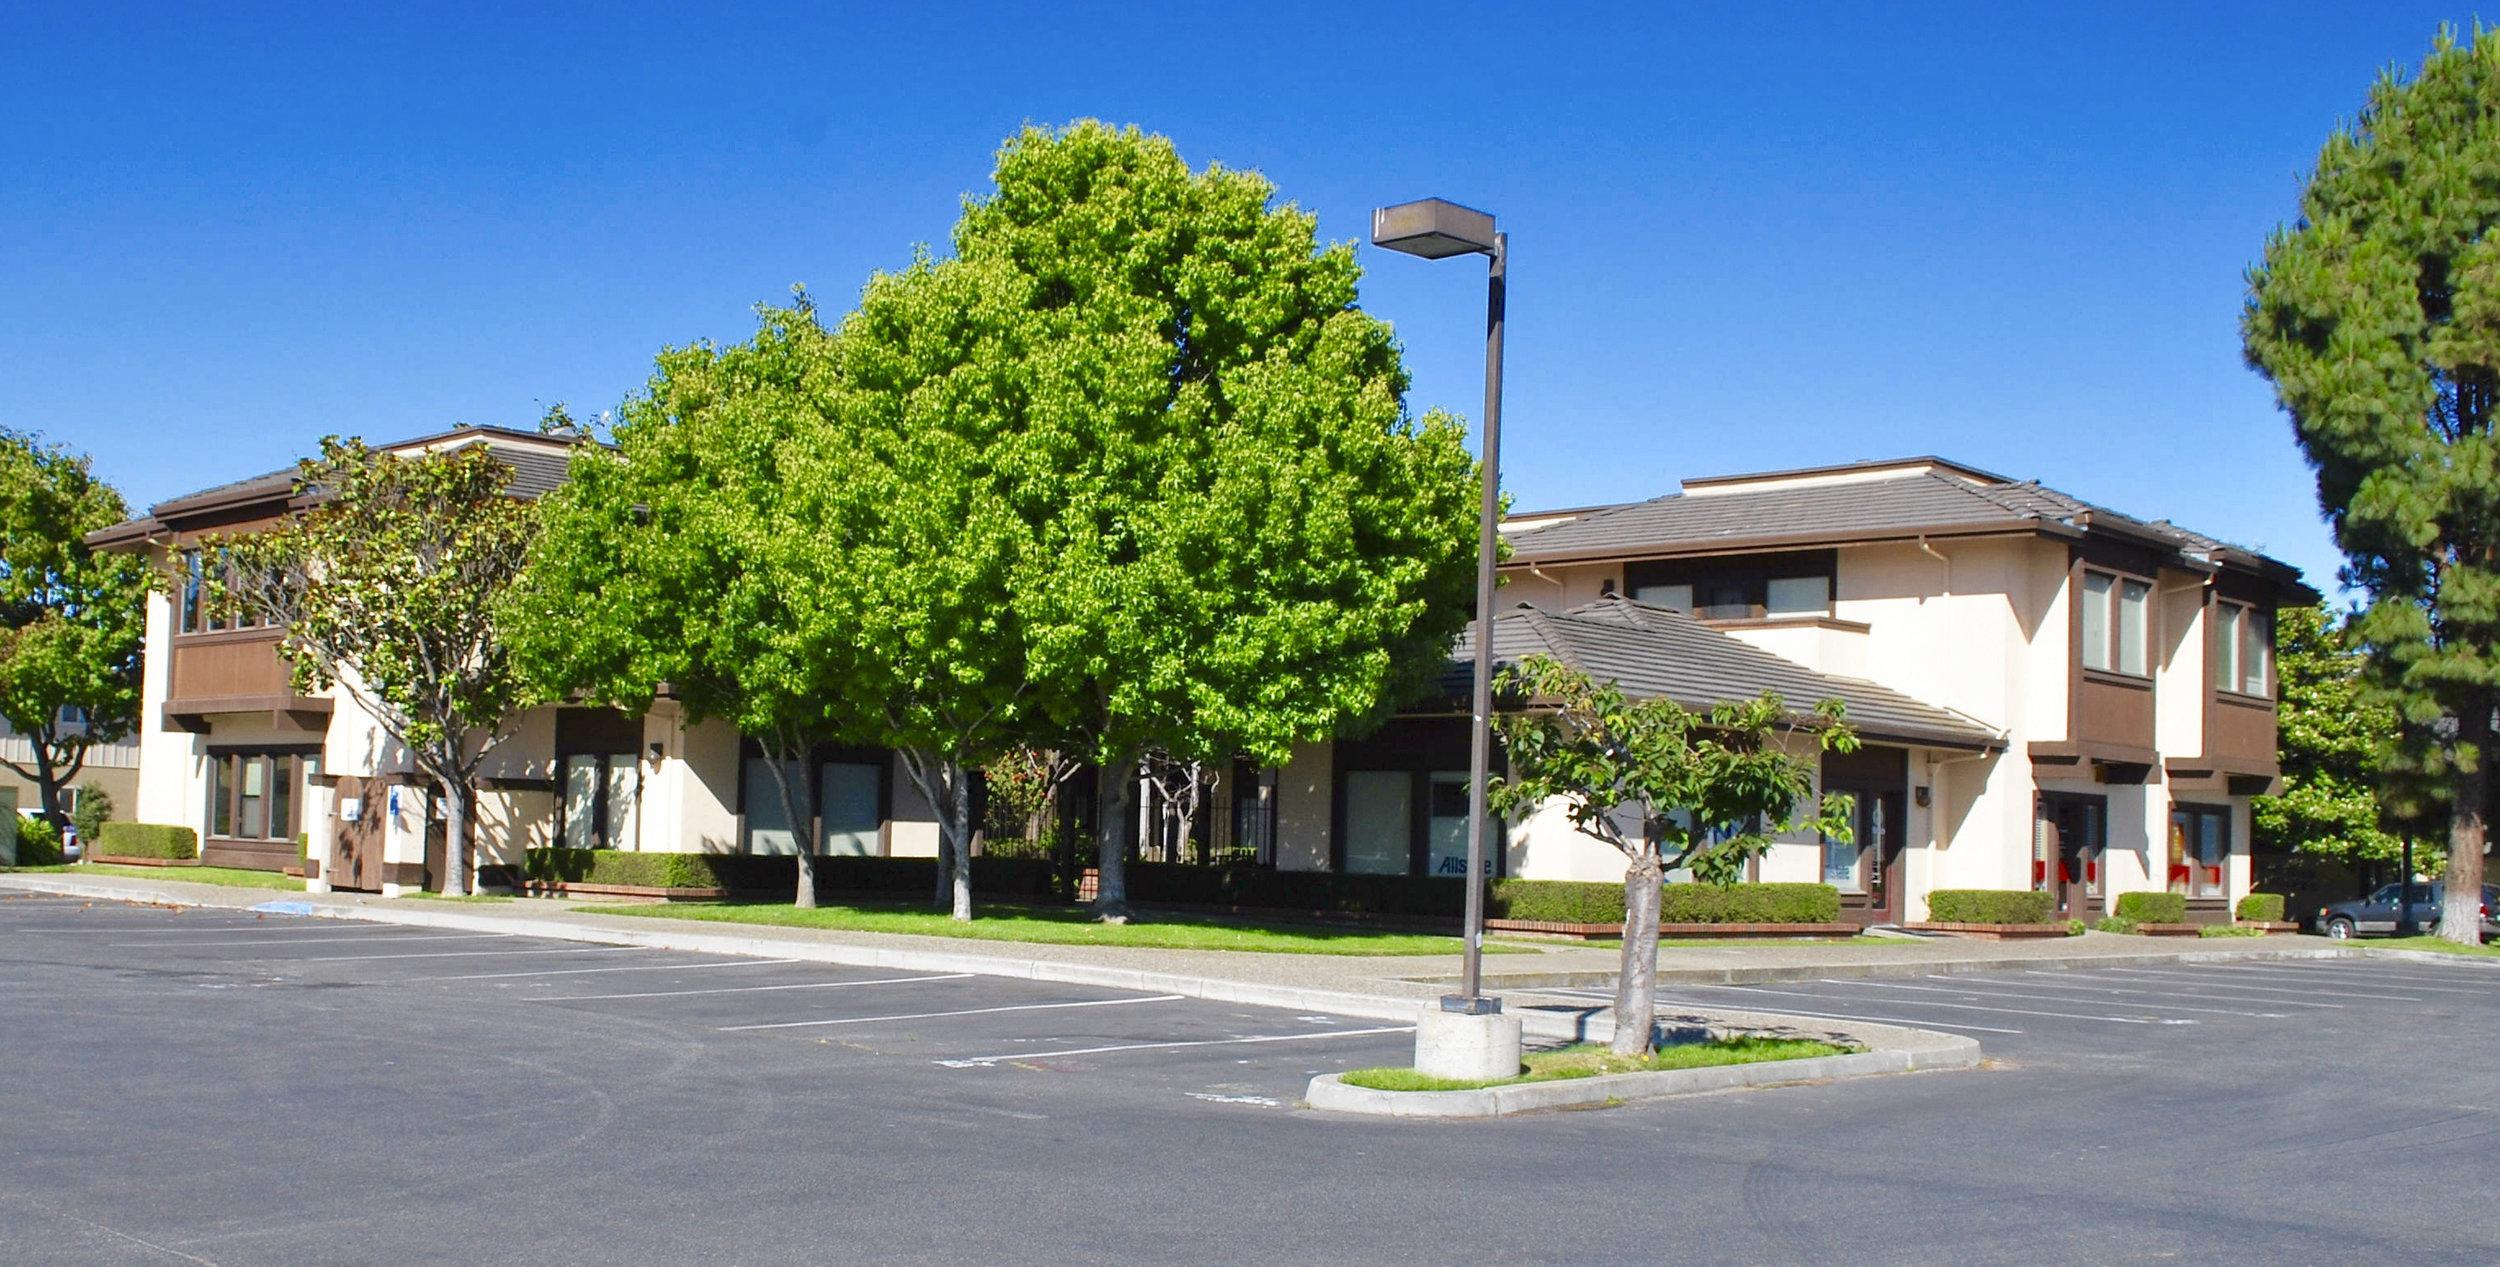 975 W. Alisal St. Suite E Salinas, CA 93901